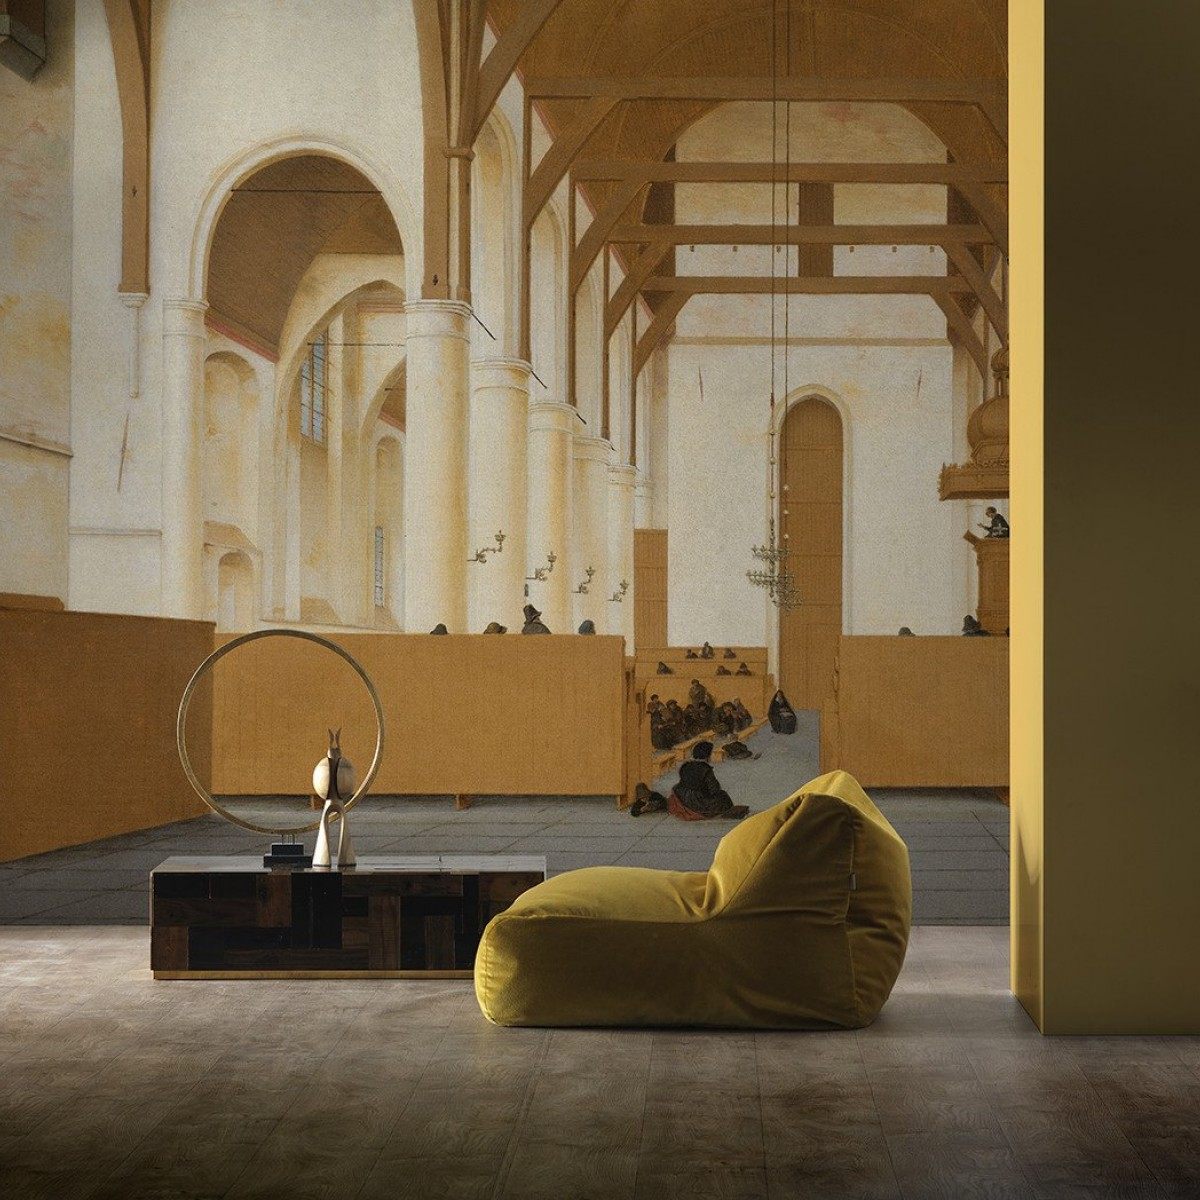 Tapet designer Rijksmuseum - Saint-Odulphus Church by Piet Hein Eek, RKS-02, NLXL, 7.3 - 13.1 mp / model